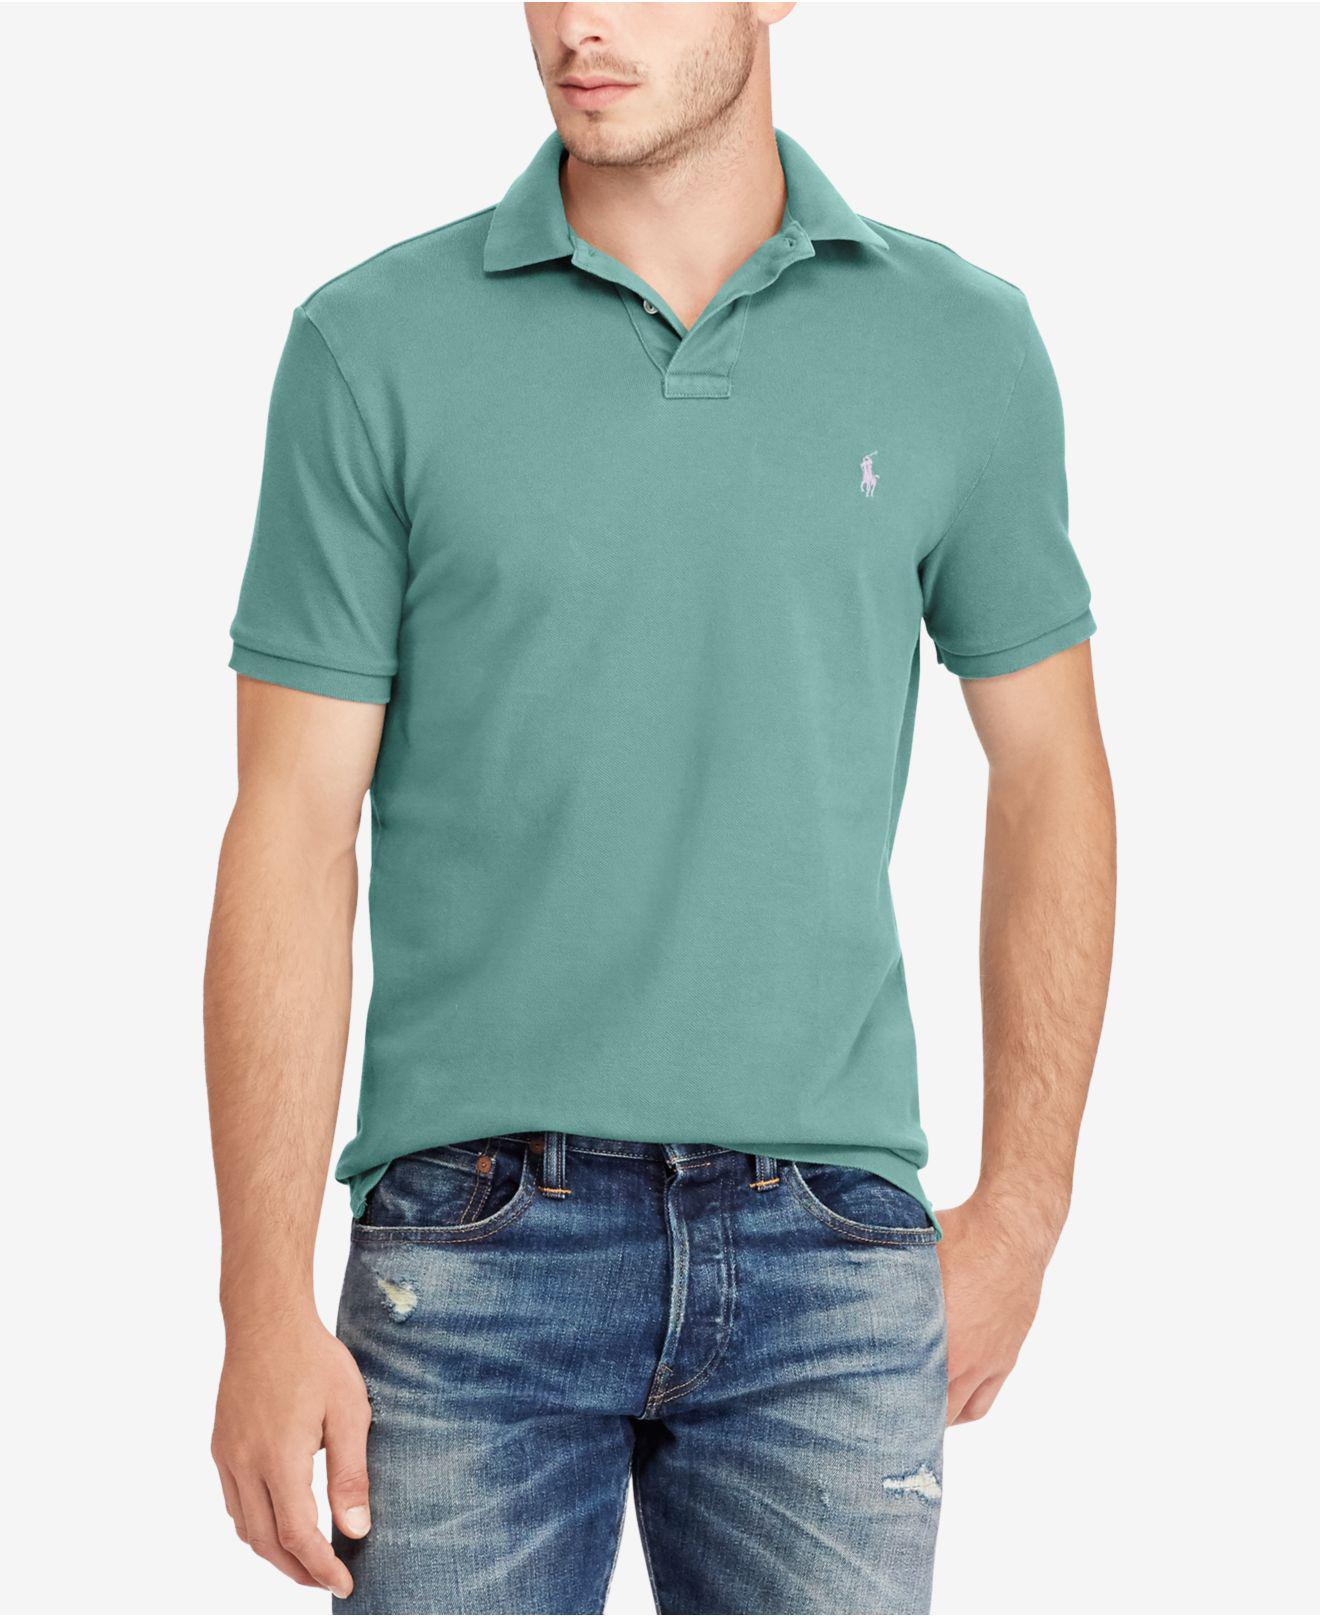 47b2046dcd80 ... shirt polos men macys 205dd 93453  real polo ralph lauren custom slim  fit classic mesh polo 5439c 73500